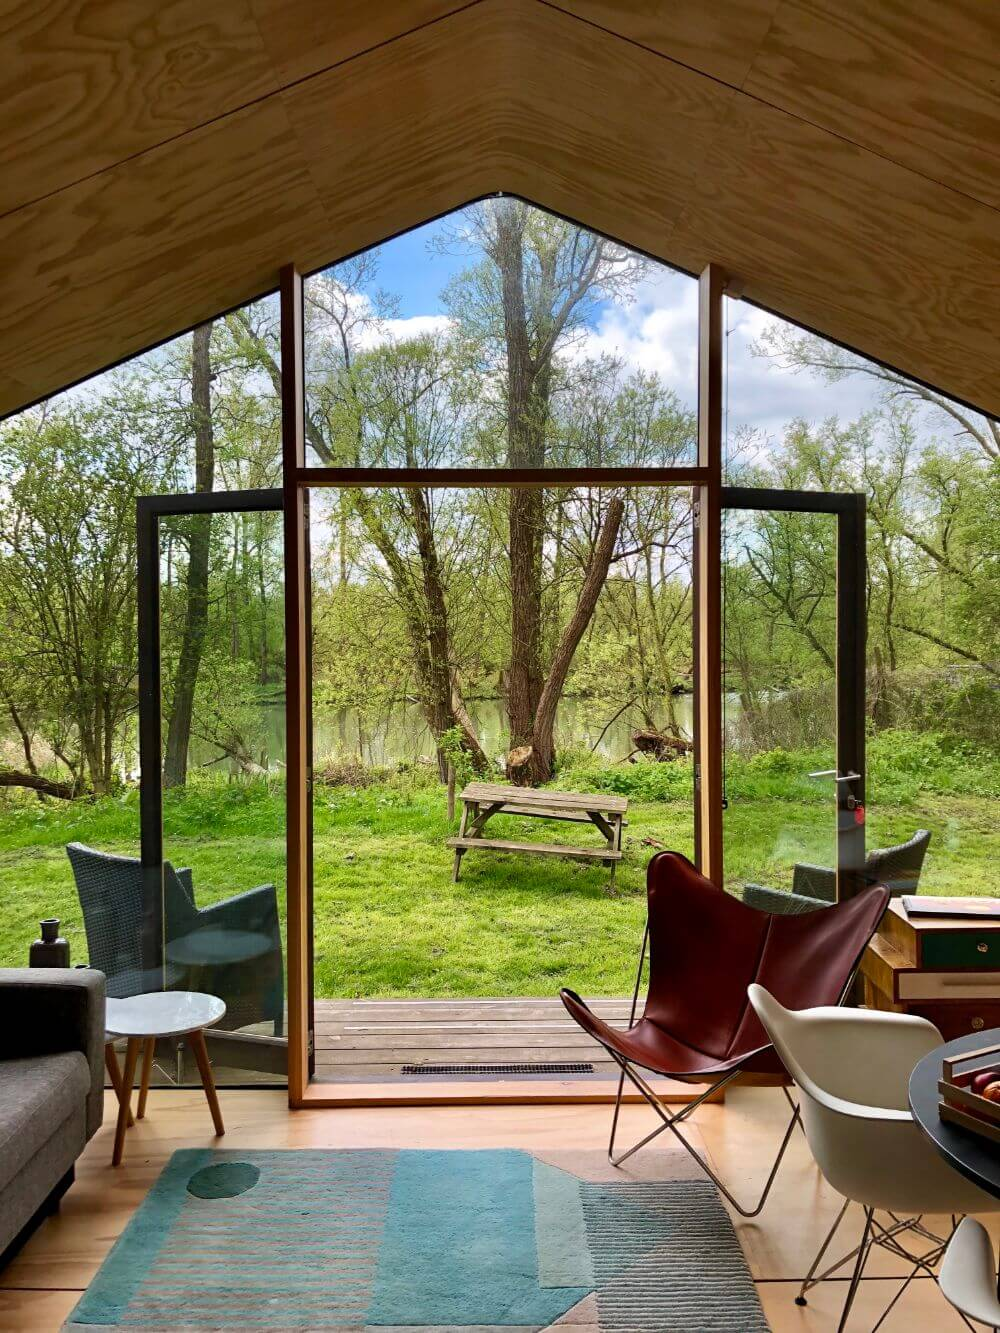 Bijzonder logeren Wikkelhouse Dordrecht Nationaal Park De Biesbosch kano